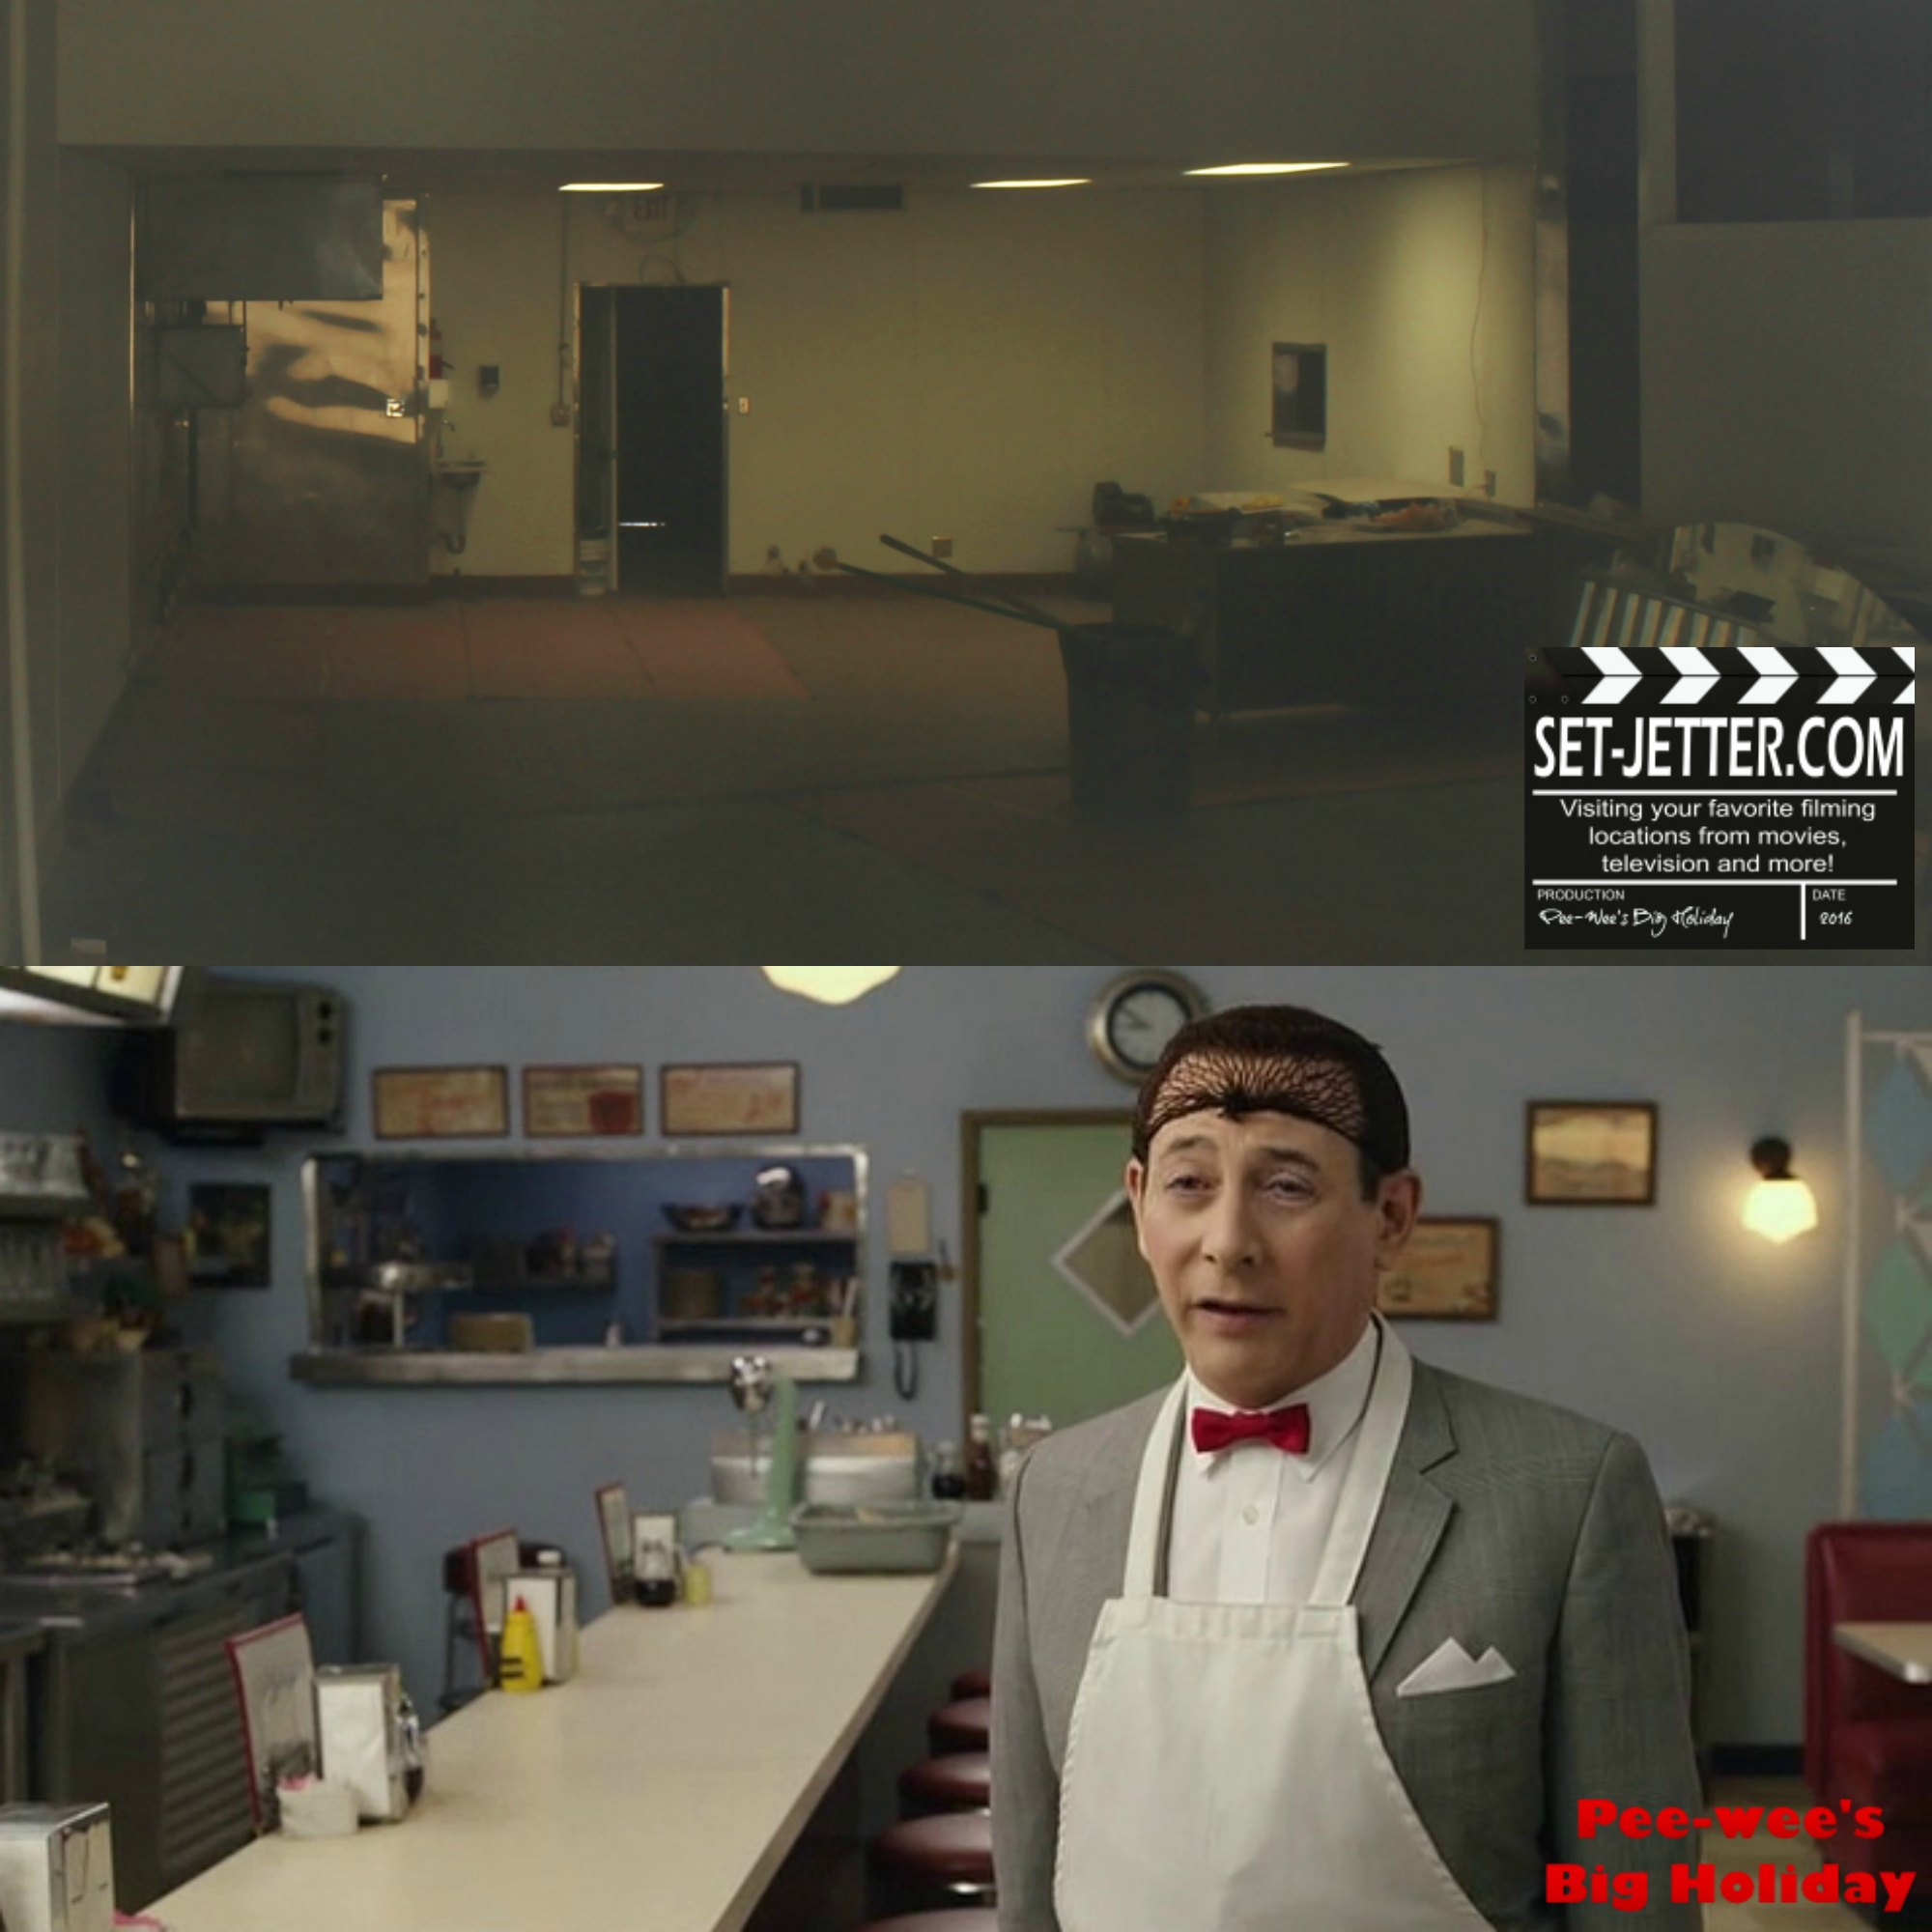 Pee Wee's Big Holiday comparison 292.jpg